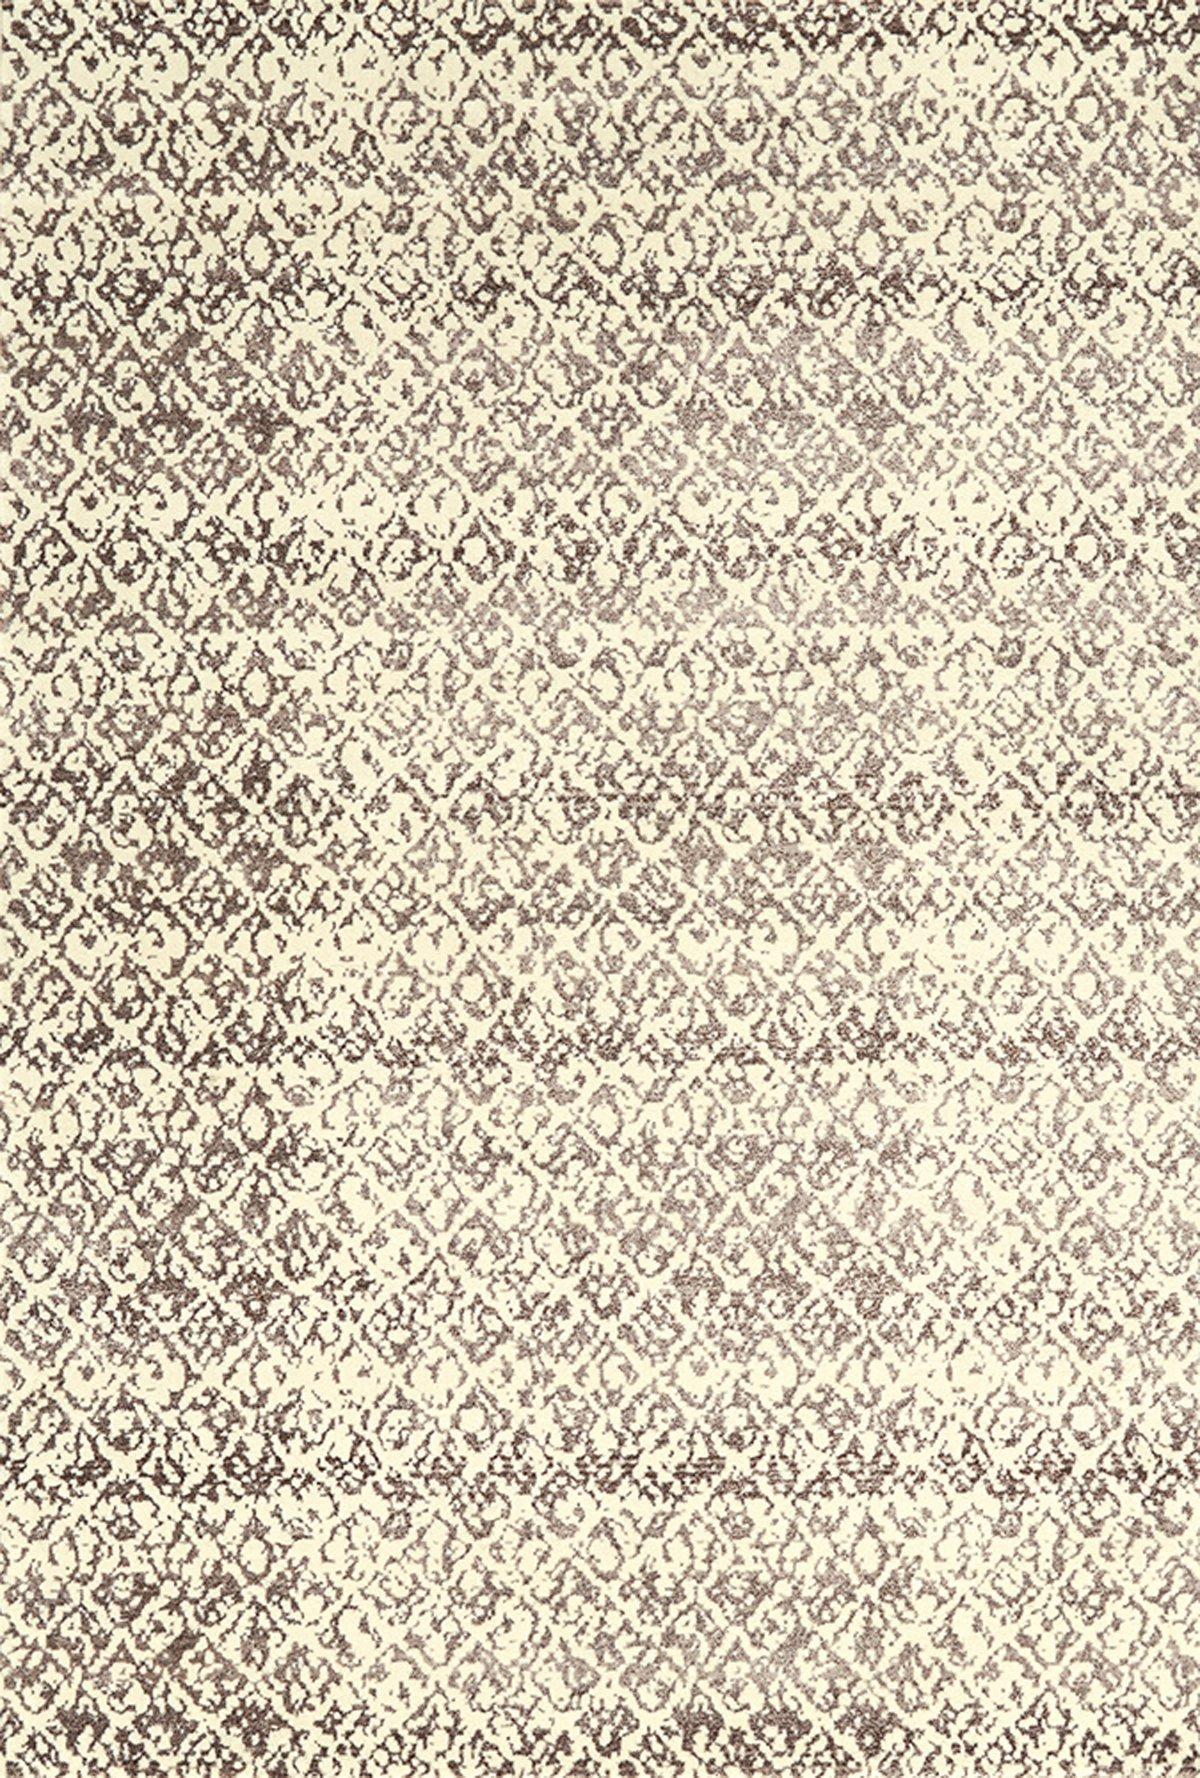 Azeri3 Light Beige Wool Blend 5x8 Area Rug